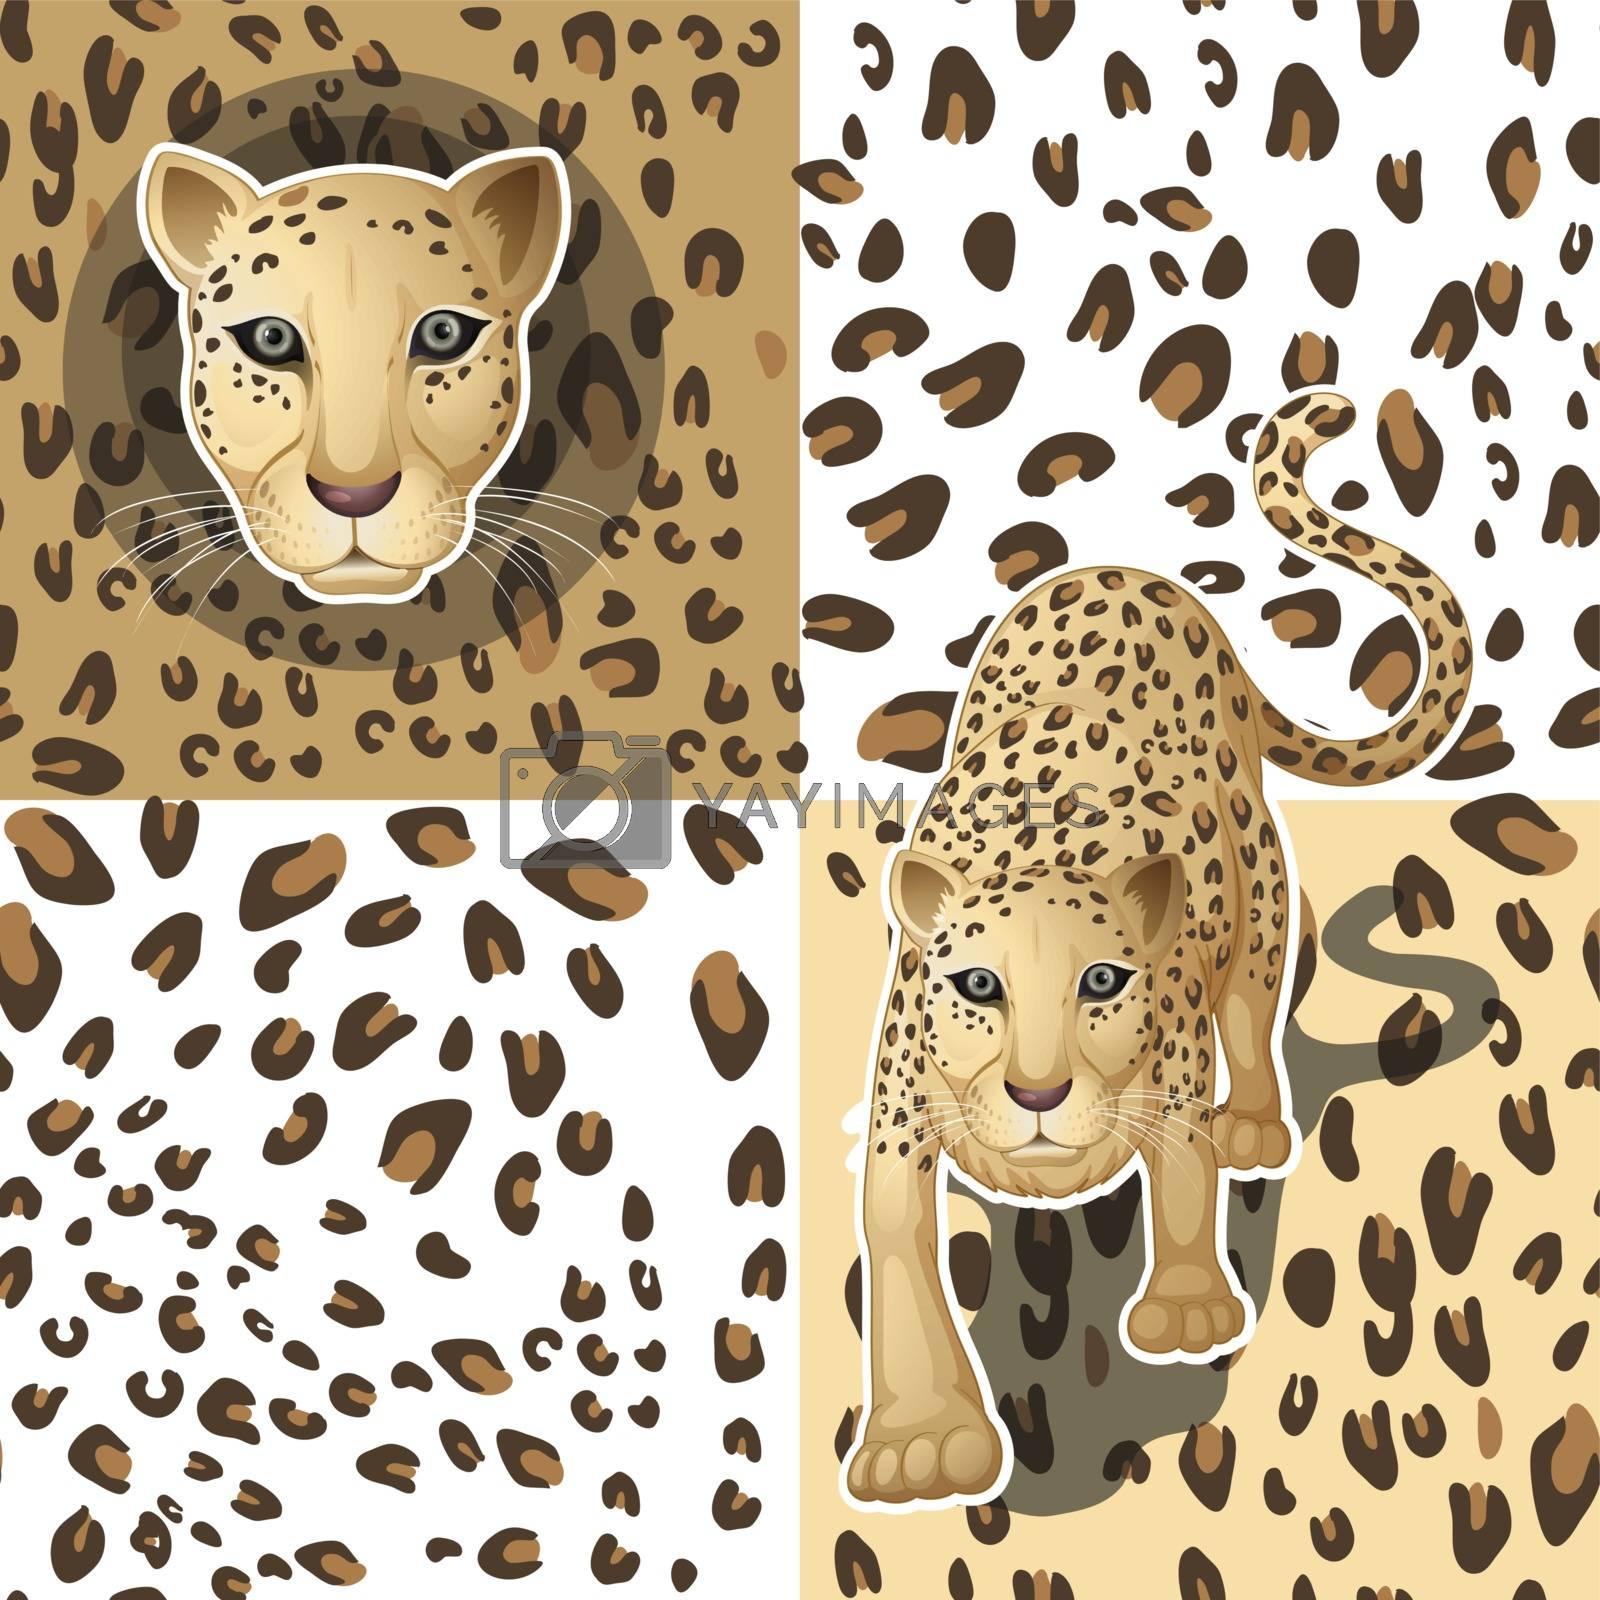 Illustration of a seamless pattern